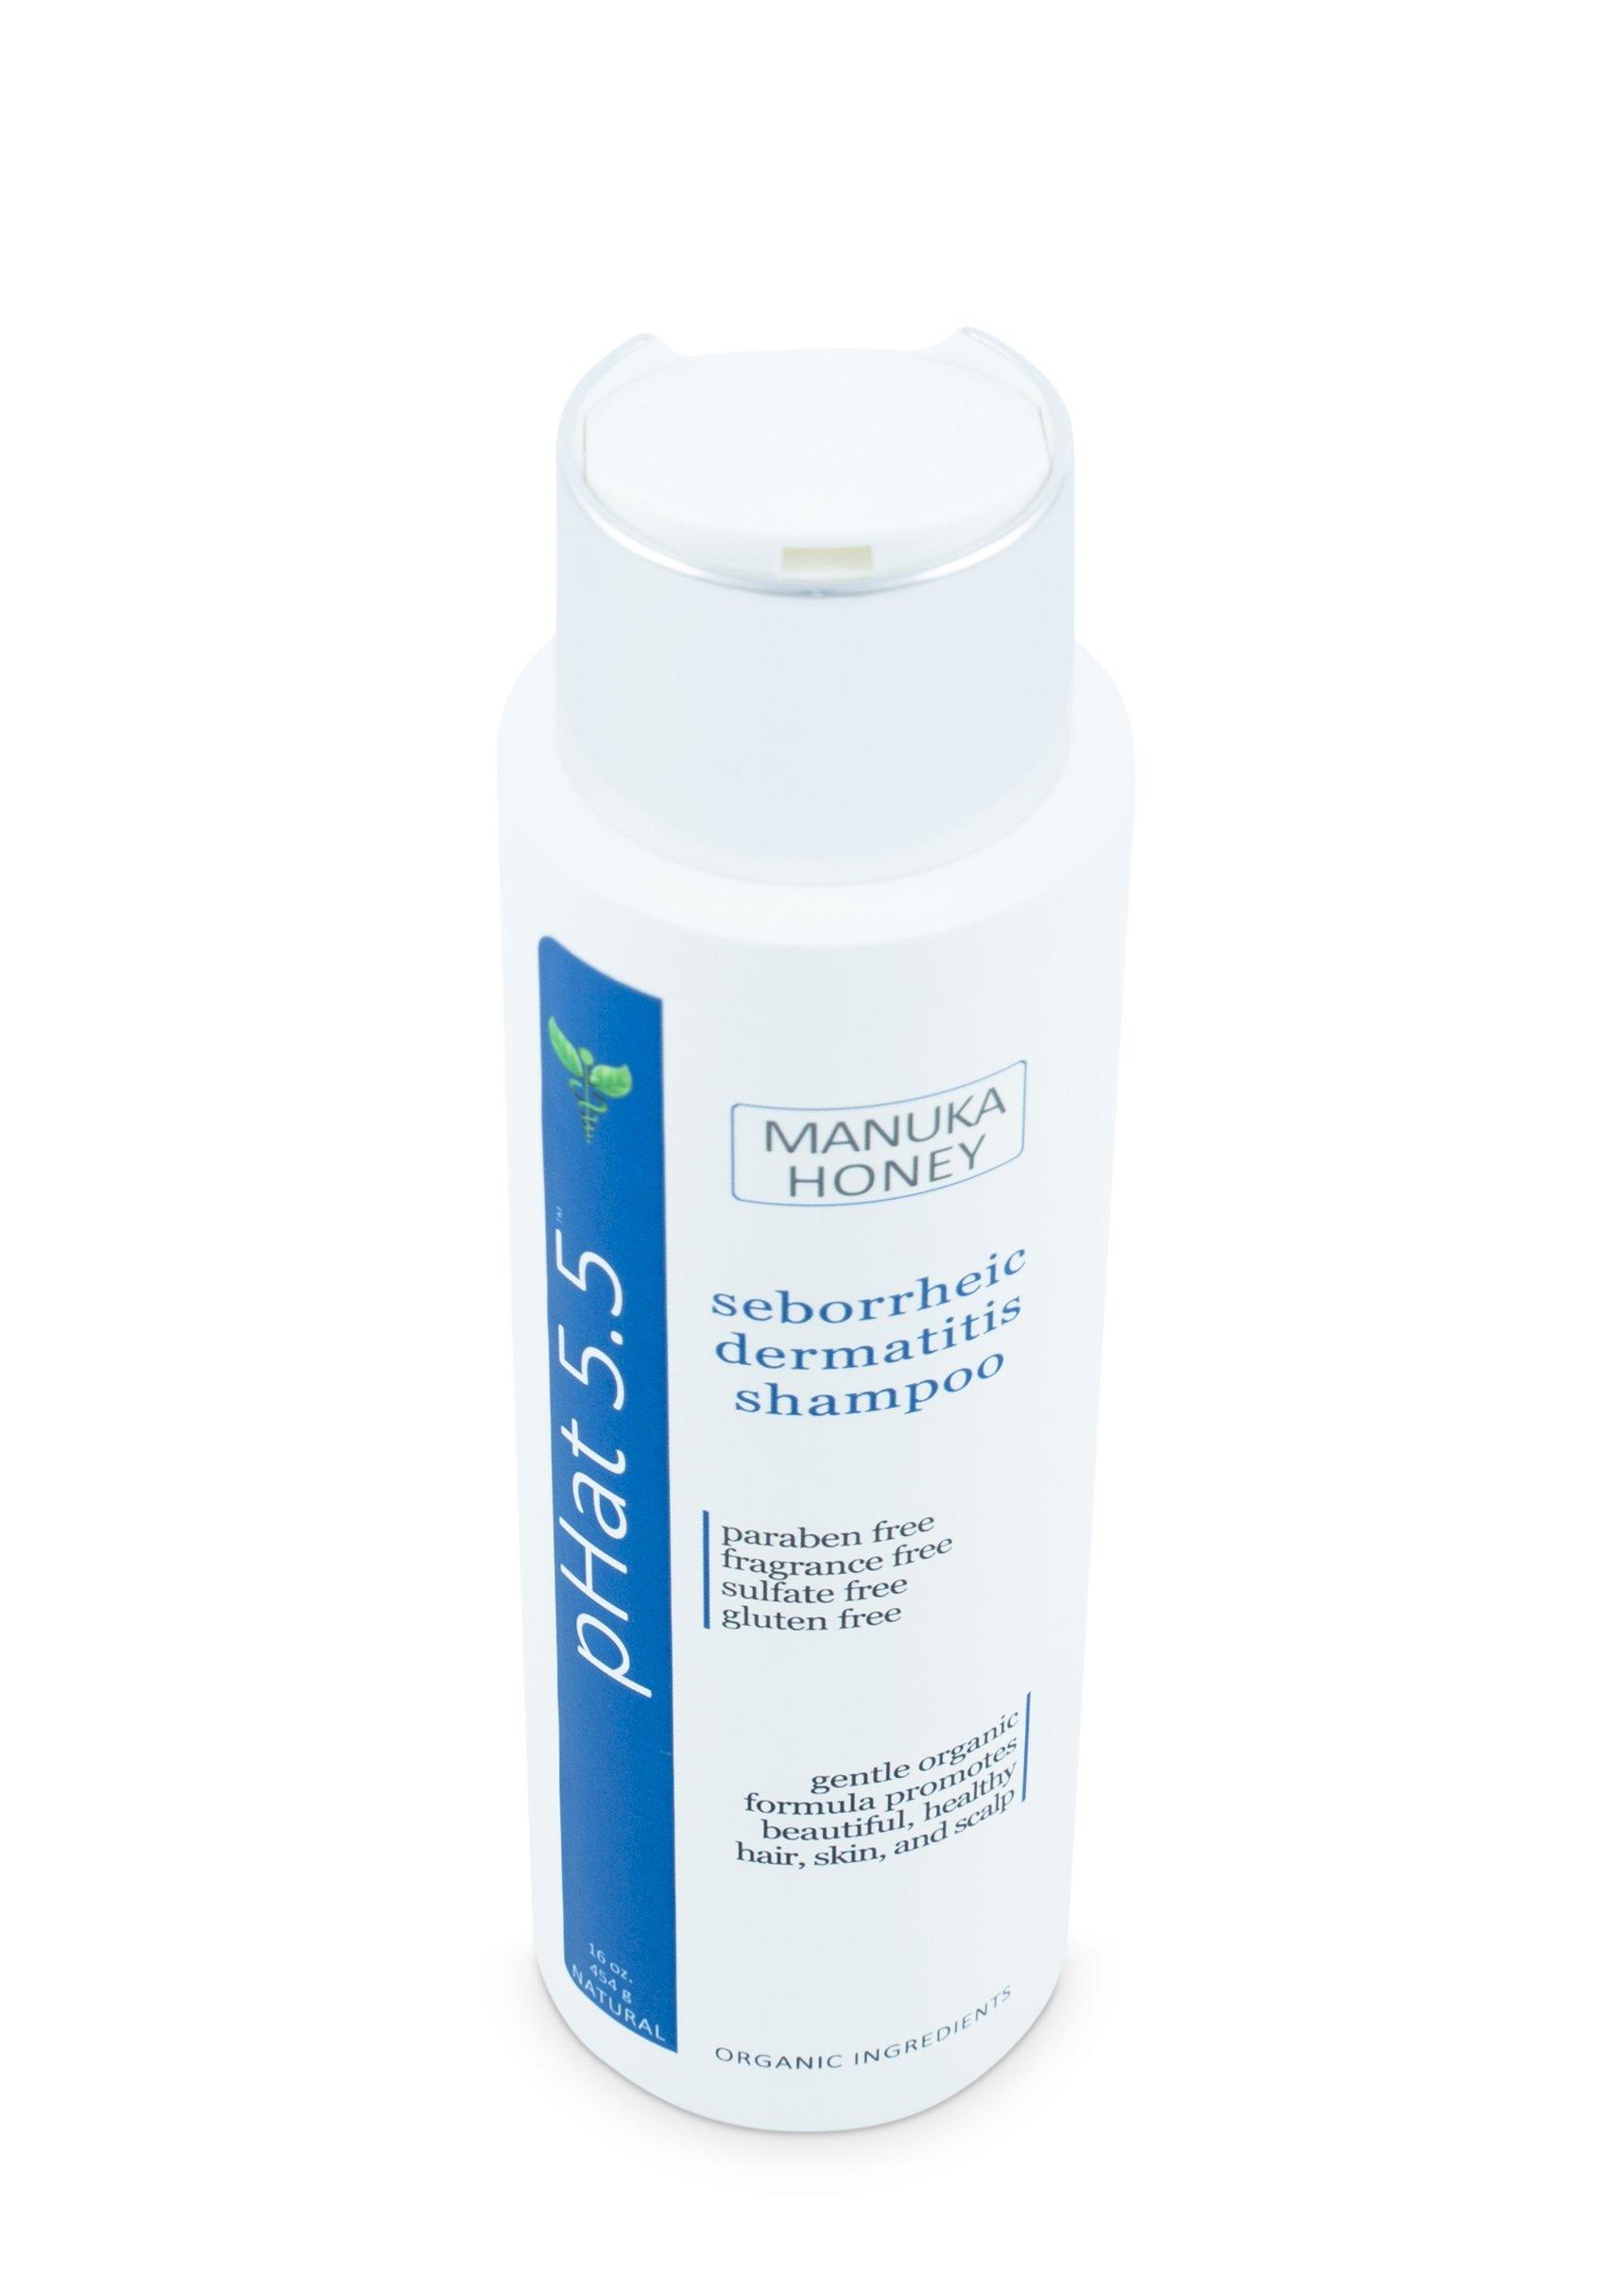 Sulfate Free Shampoo for Seborrheic Dermatitis with Manuka Honey, Coconut Oil and Aloe Vera - Dandruff and Itchy Scalp Treatment - Antifungal Moisturizing Shampoo for Dry Scalp Treatment (16 oz) by pHat 5.5 (Image #3)